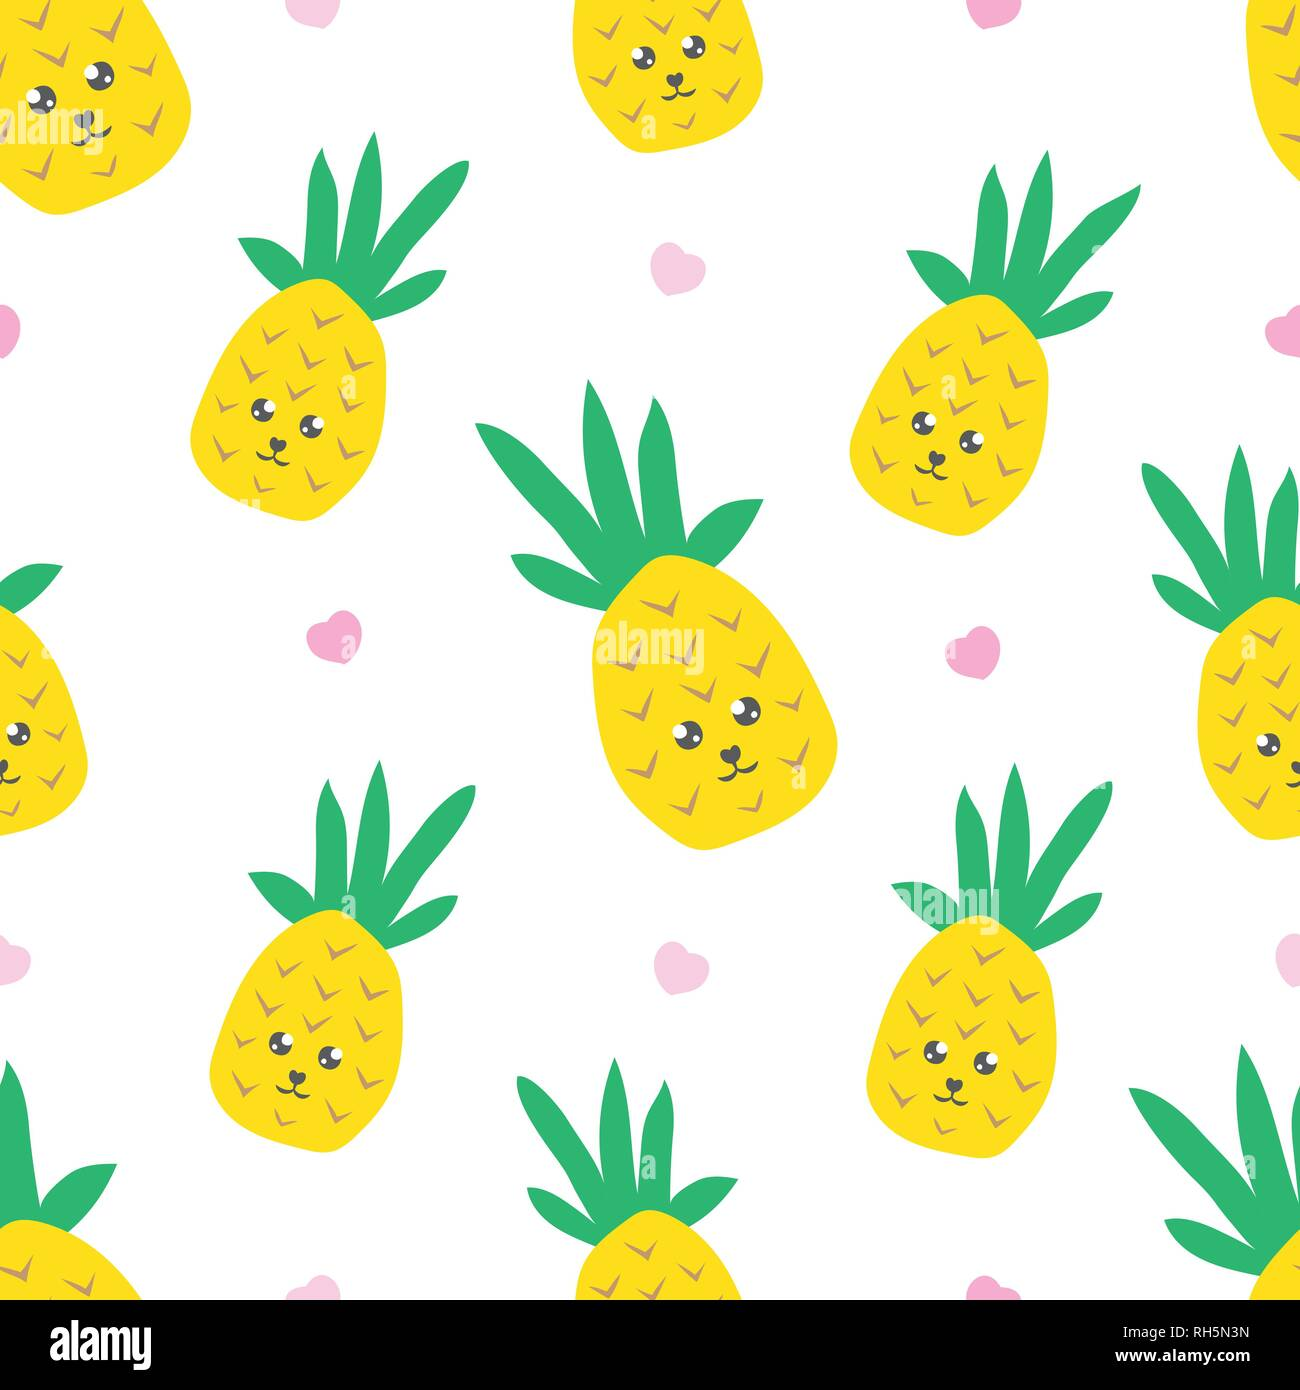 childish seamless pattern with cute kawaii pineapple creative texture for textile wallpaper fabric decor RH5N3N